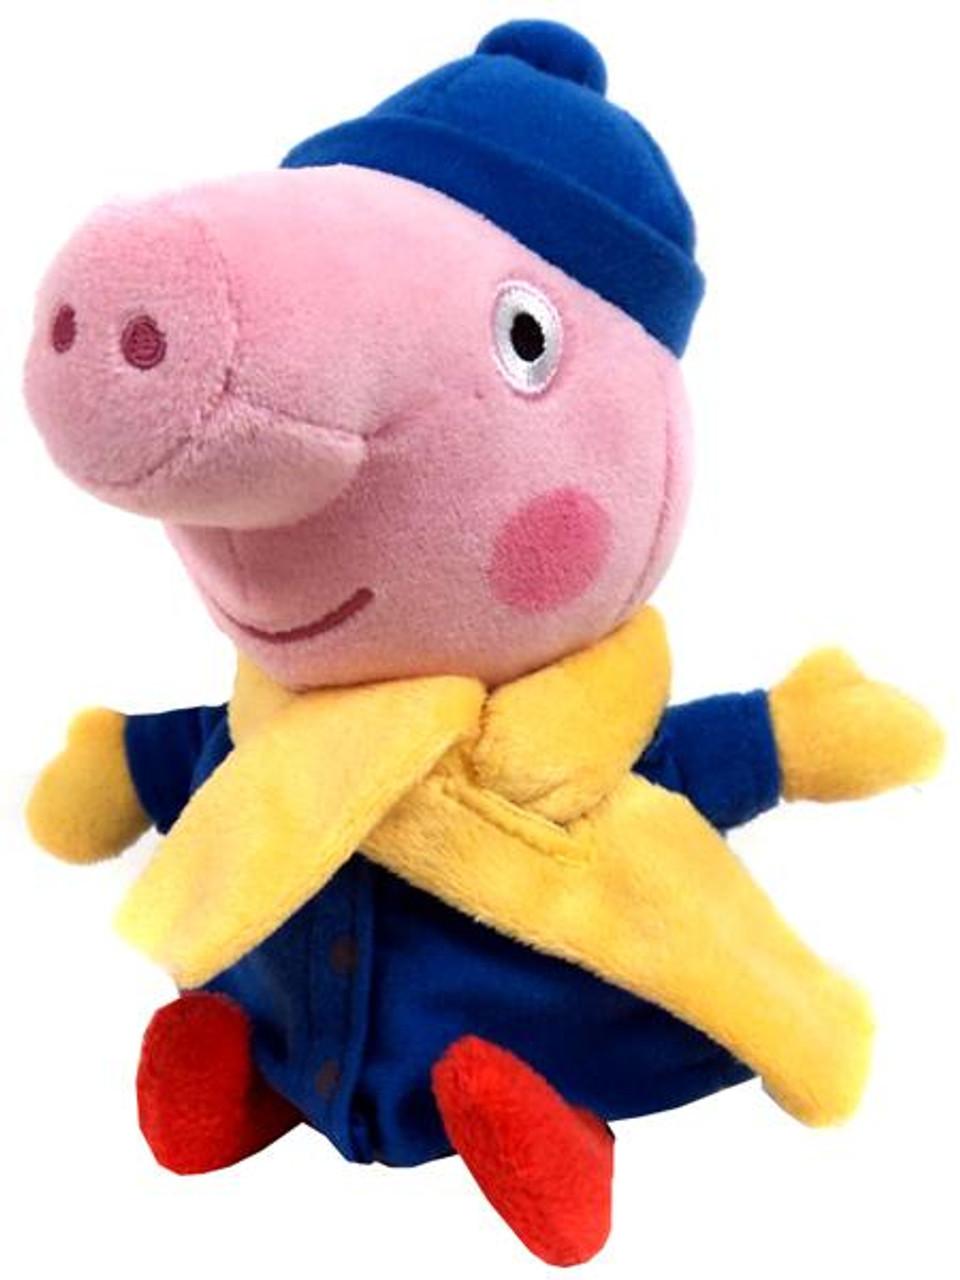 Beanie Babies Peppa Pig Baby George in Winter Coat Exclusive Beanie Baby Plush